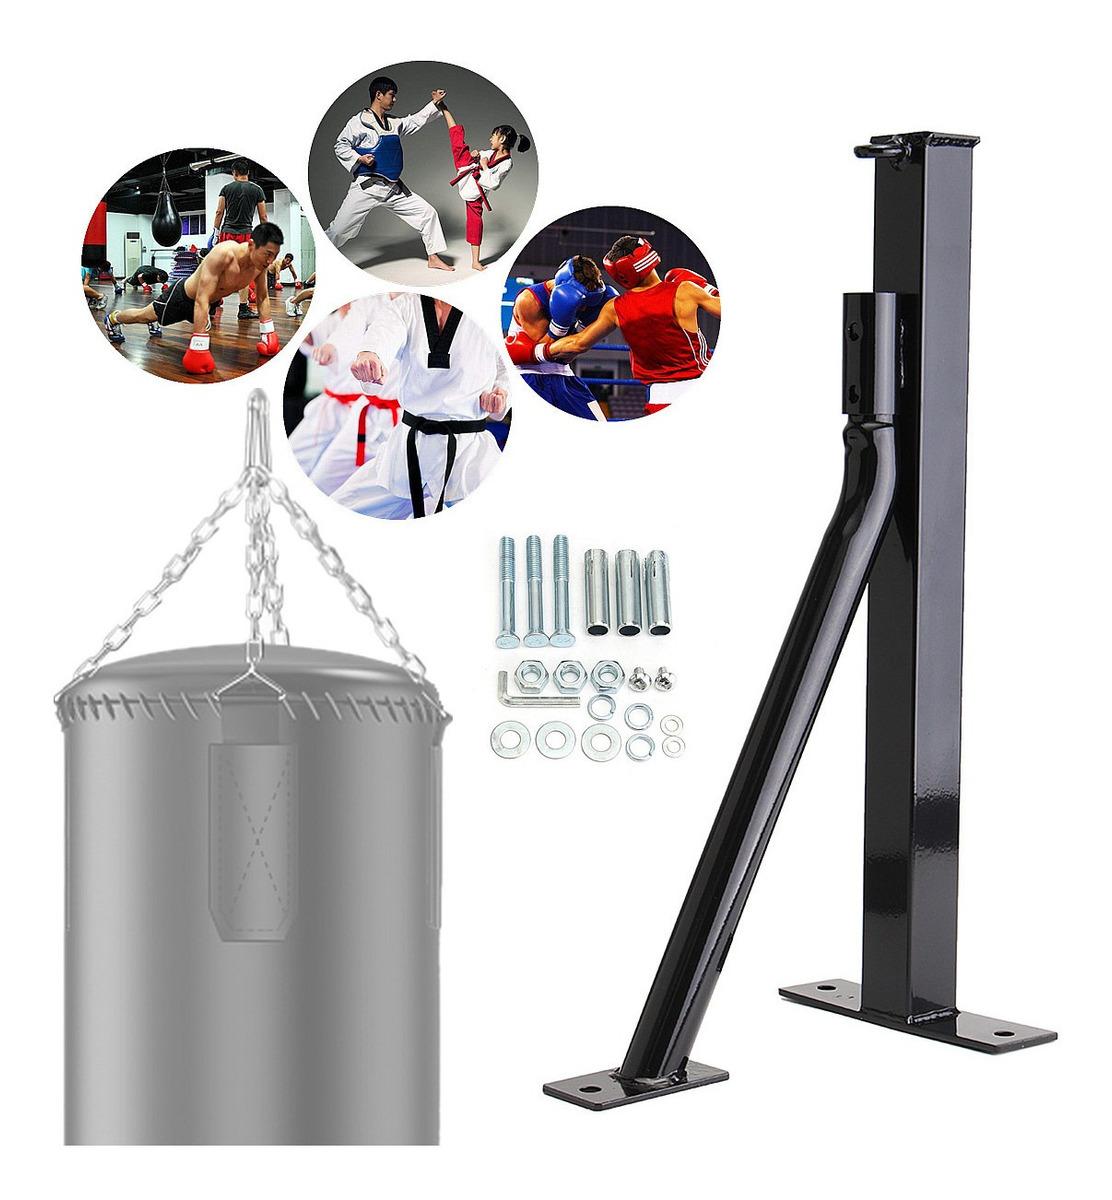 Soporte de Saco de Boxeo Soporte de Pared para Saco de Boxeo de M/áxima 100 kg Construcci/ón de Acero Boxing Punch Bag No Est/á Incluido